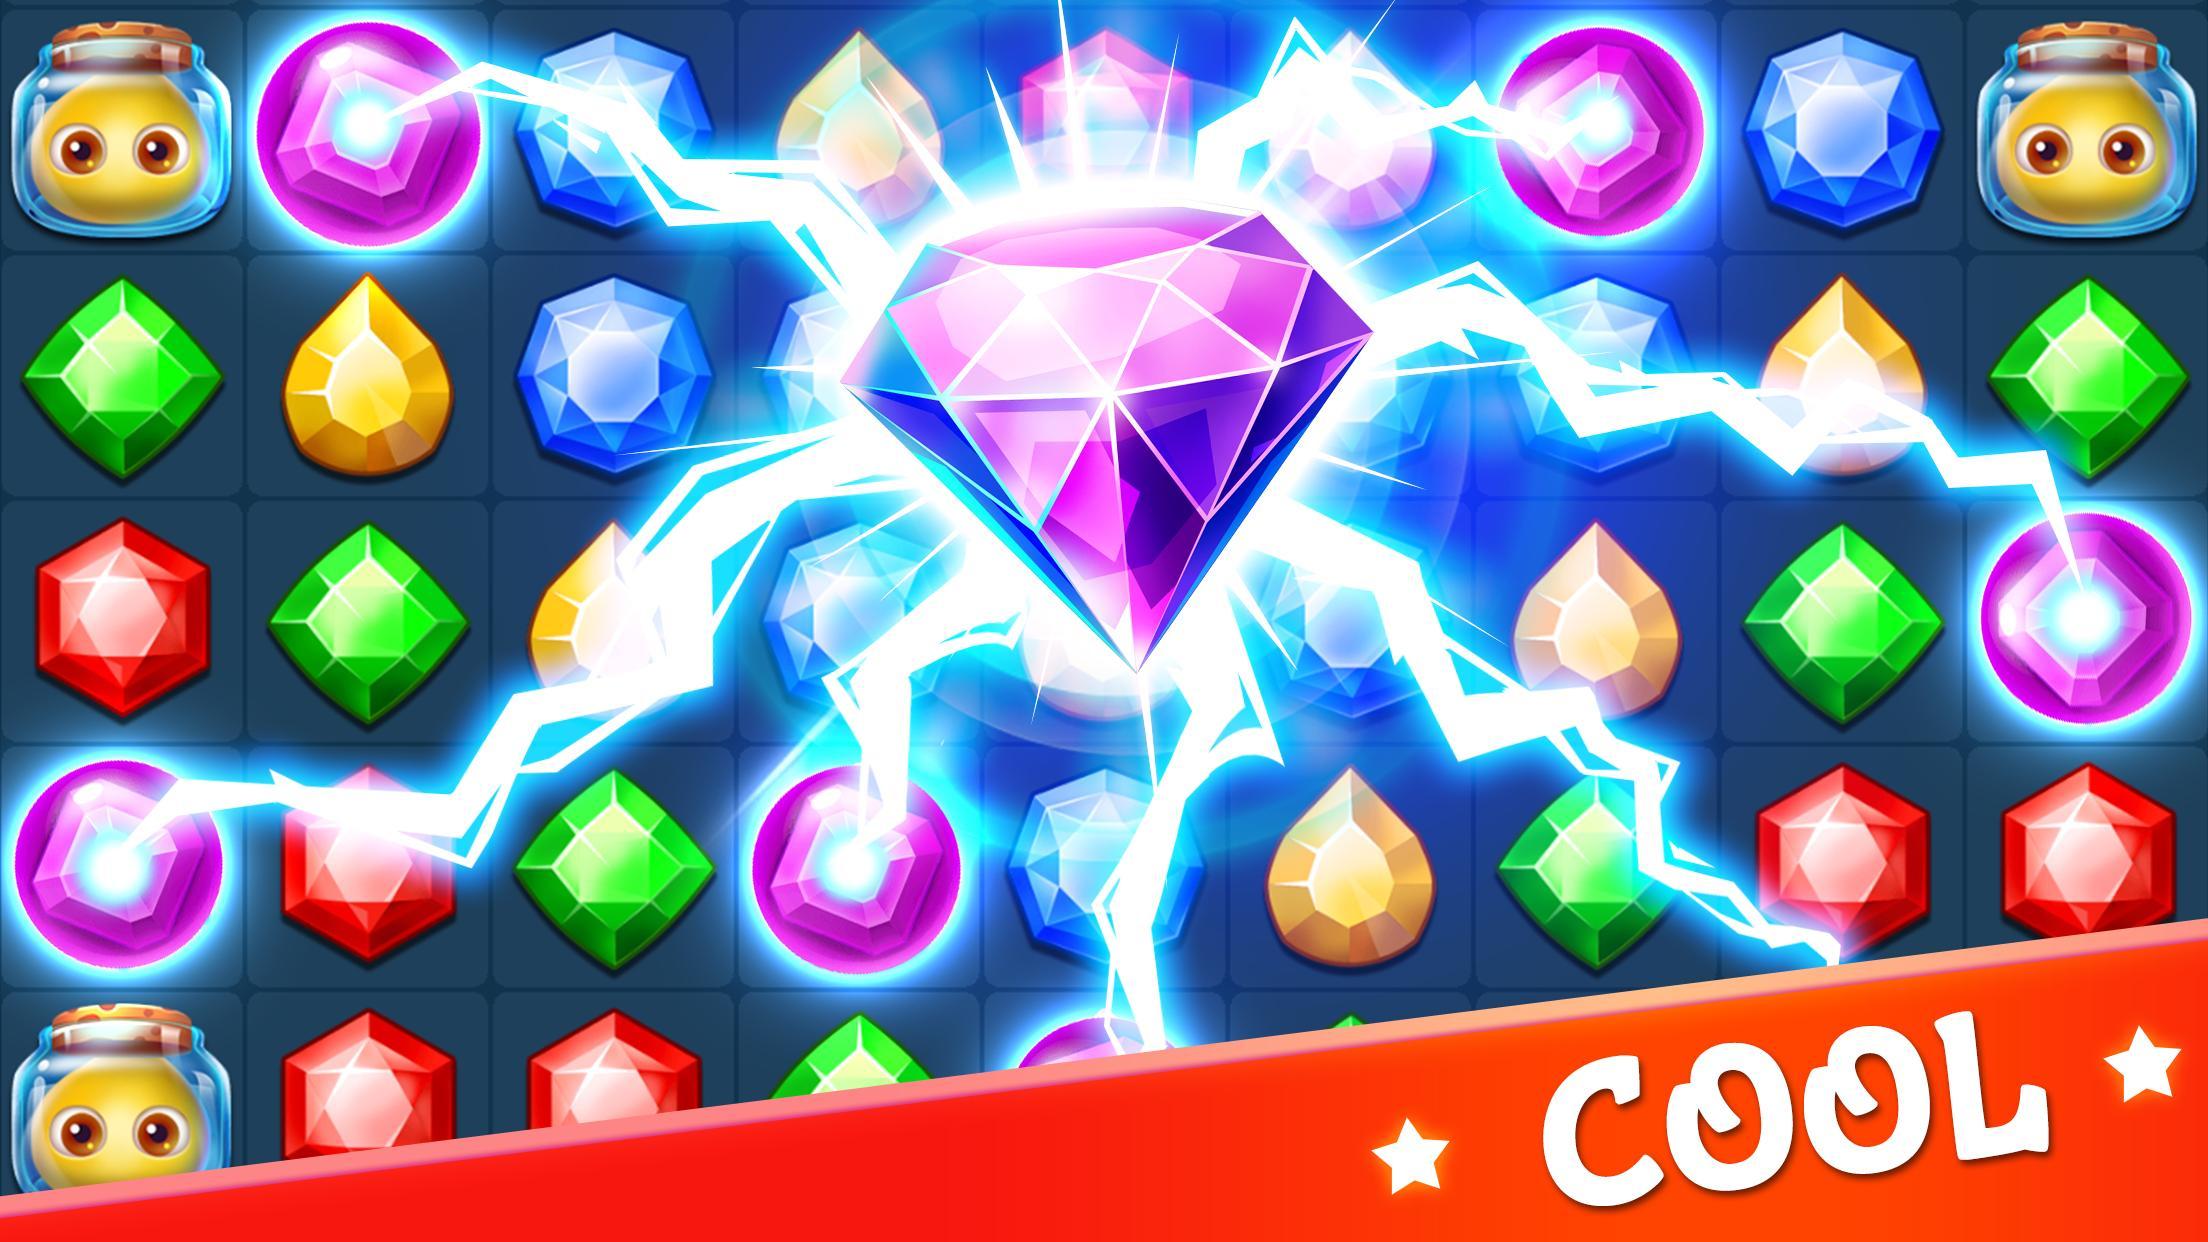 Jewels Legend - Match 3 Puzzle 2.33.3 Screenshot 6